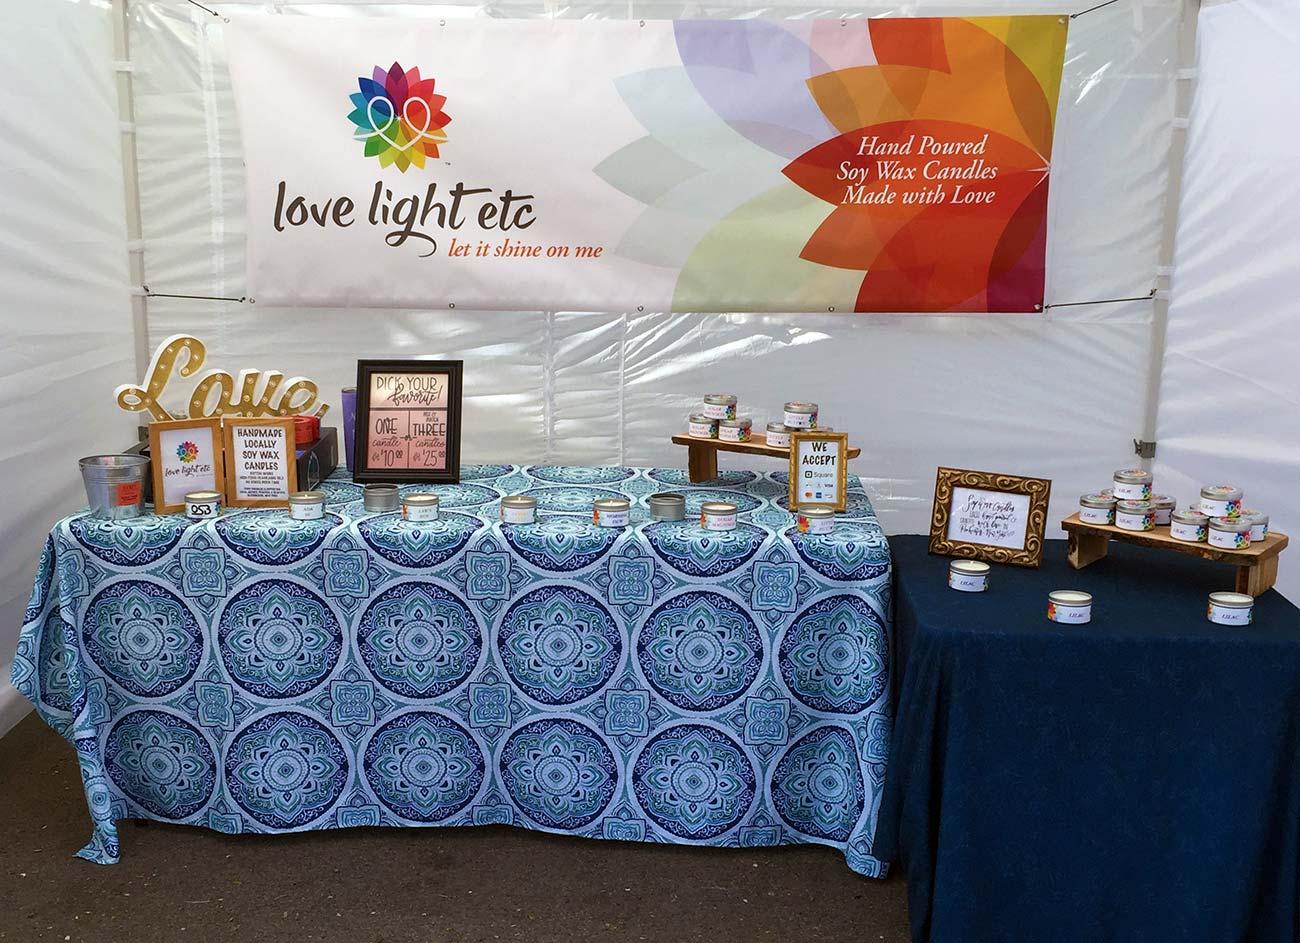 Love Light Etc Event Booth